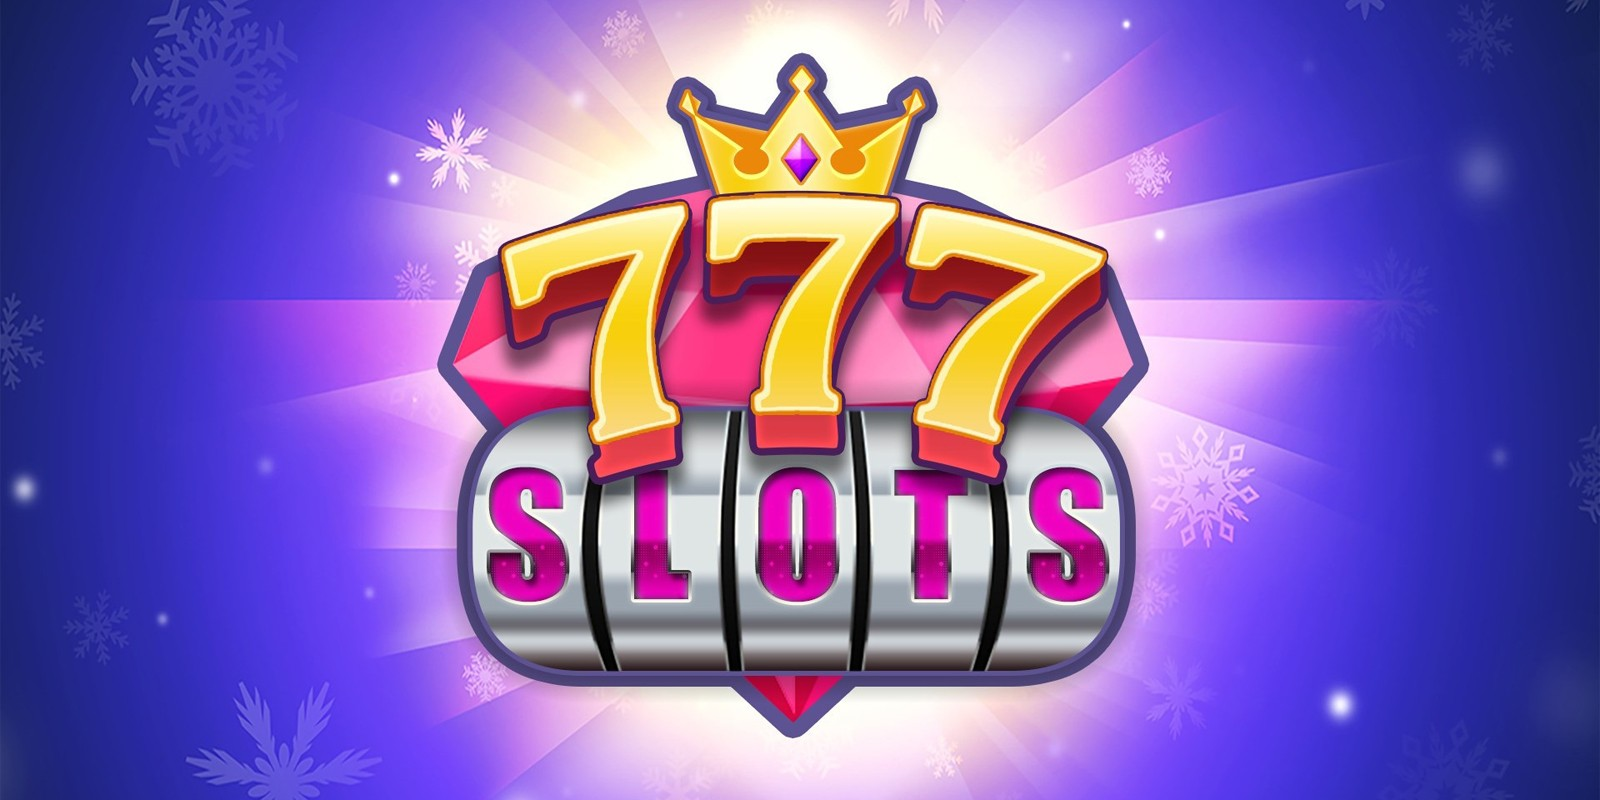 Sevens Slots - Unity Game